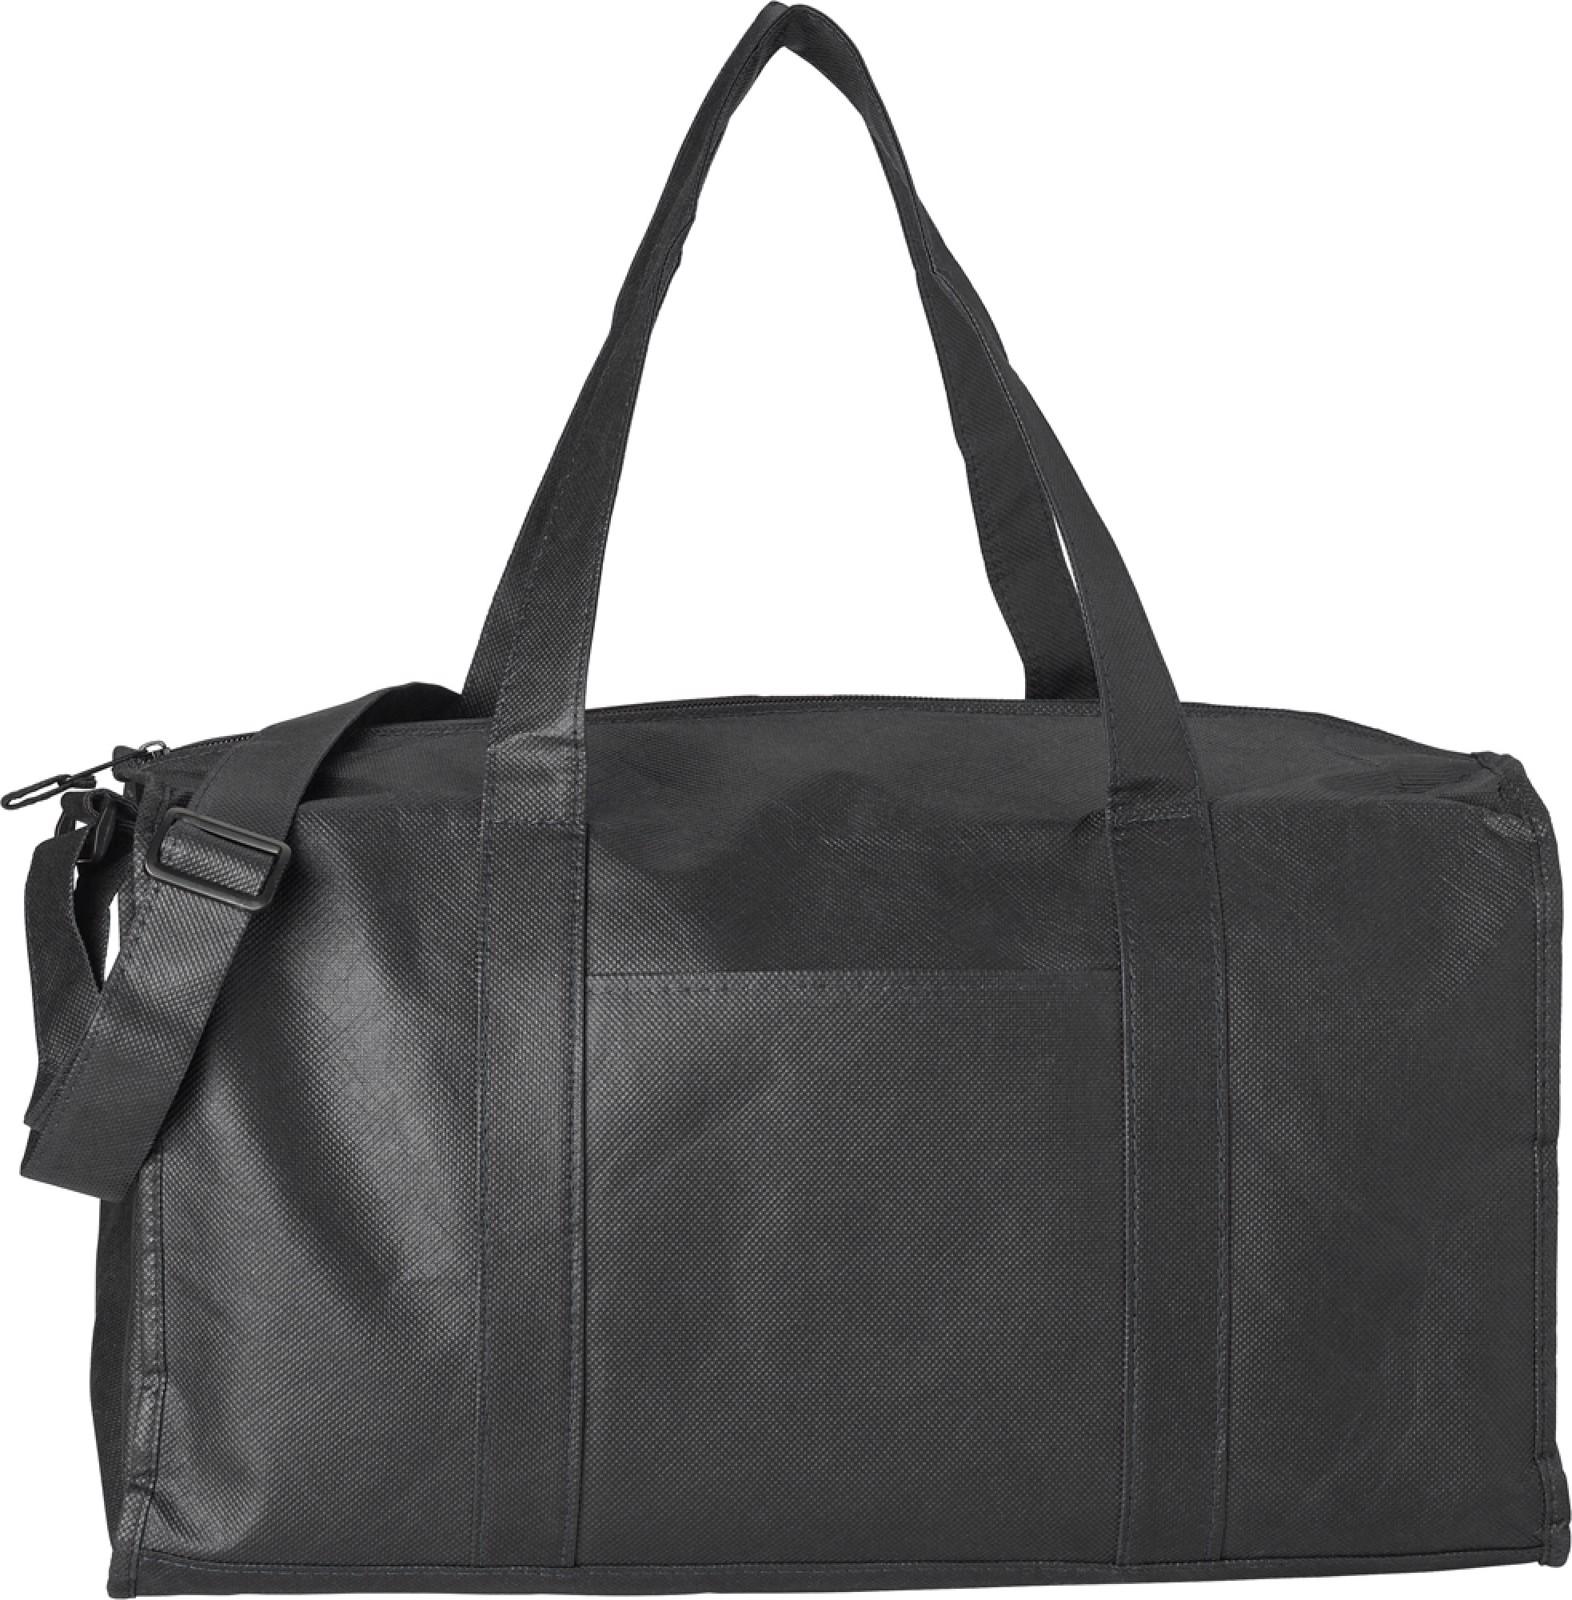 Nonwoven (100 gr/m²) sports bag - Black